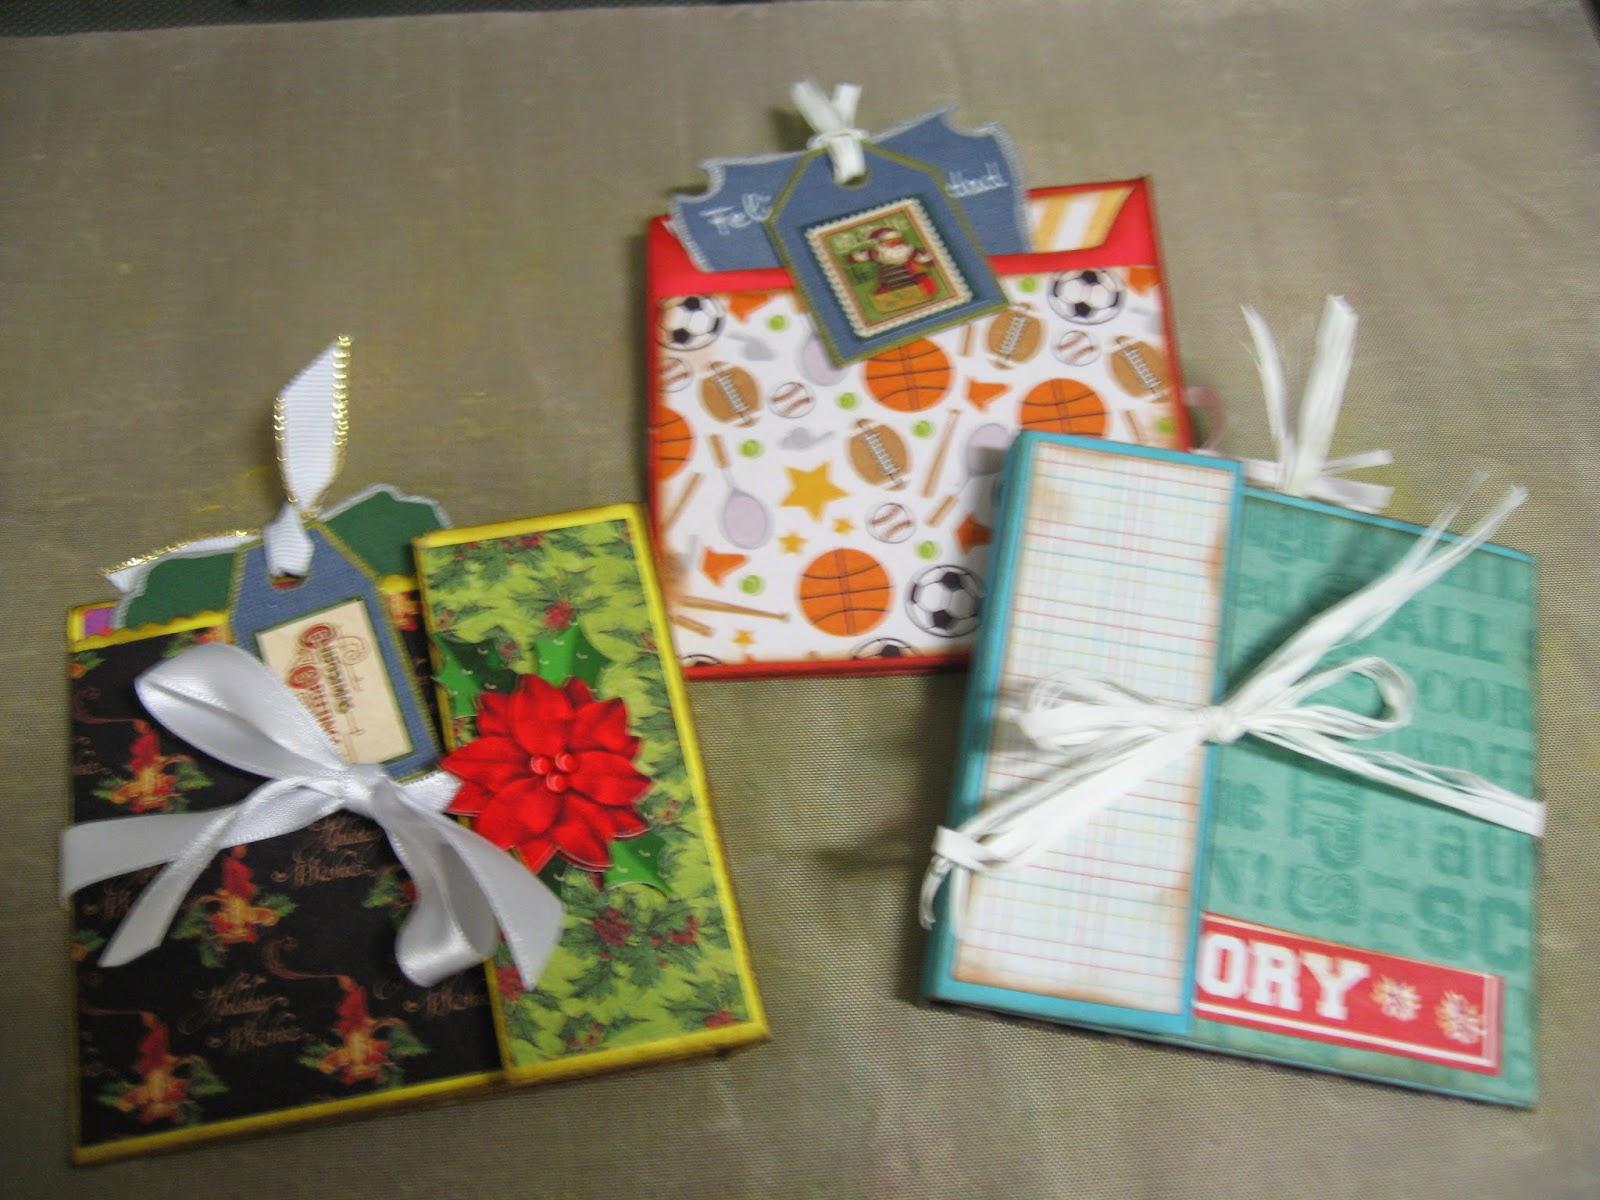 Scrapbooking detalles navidad para regalar for Detalles de navidad